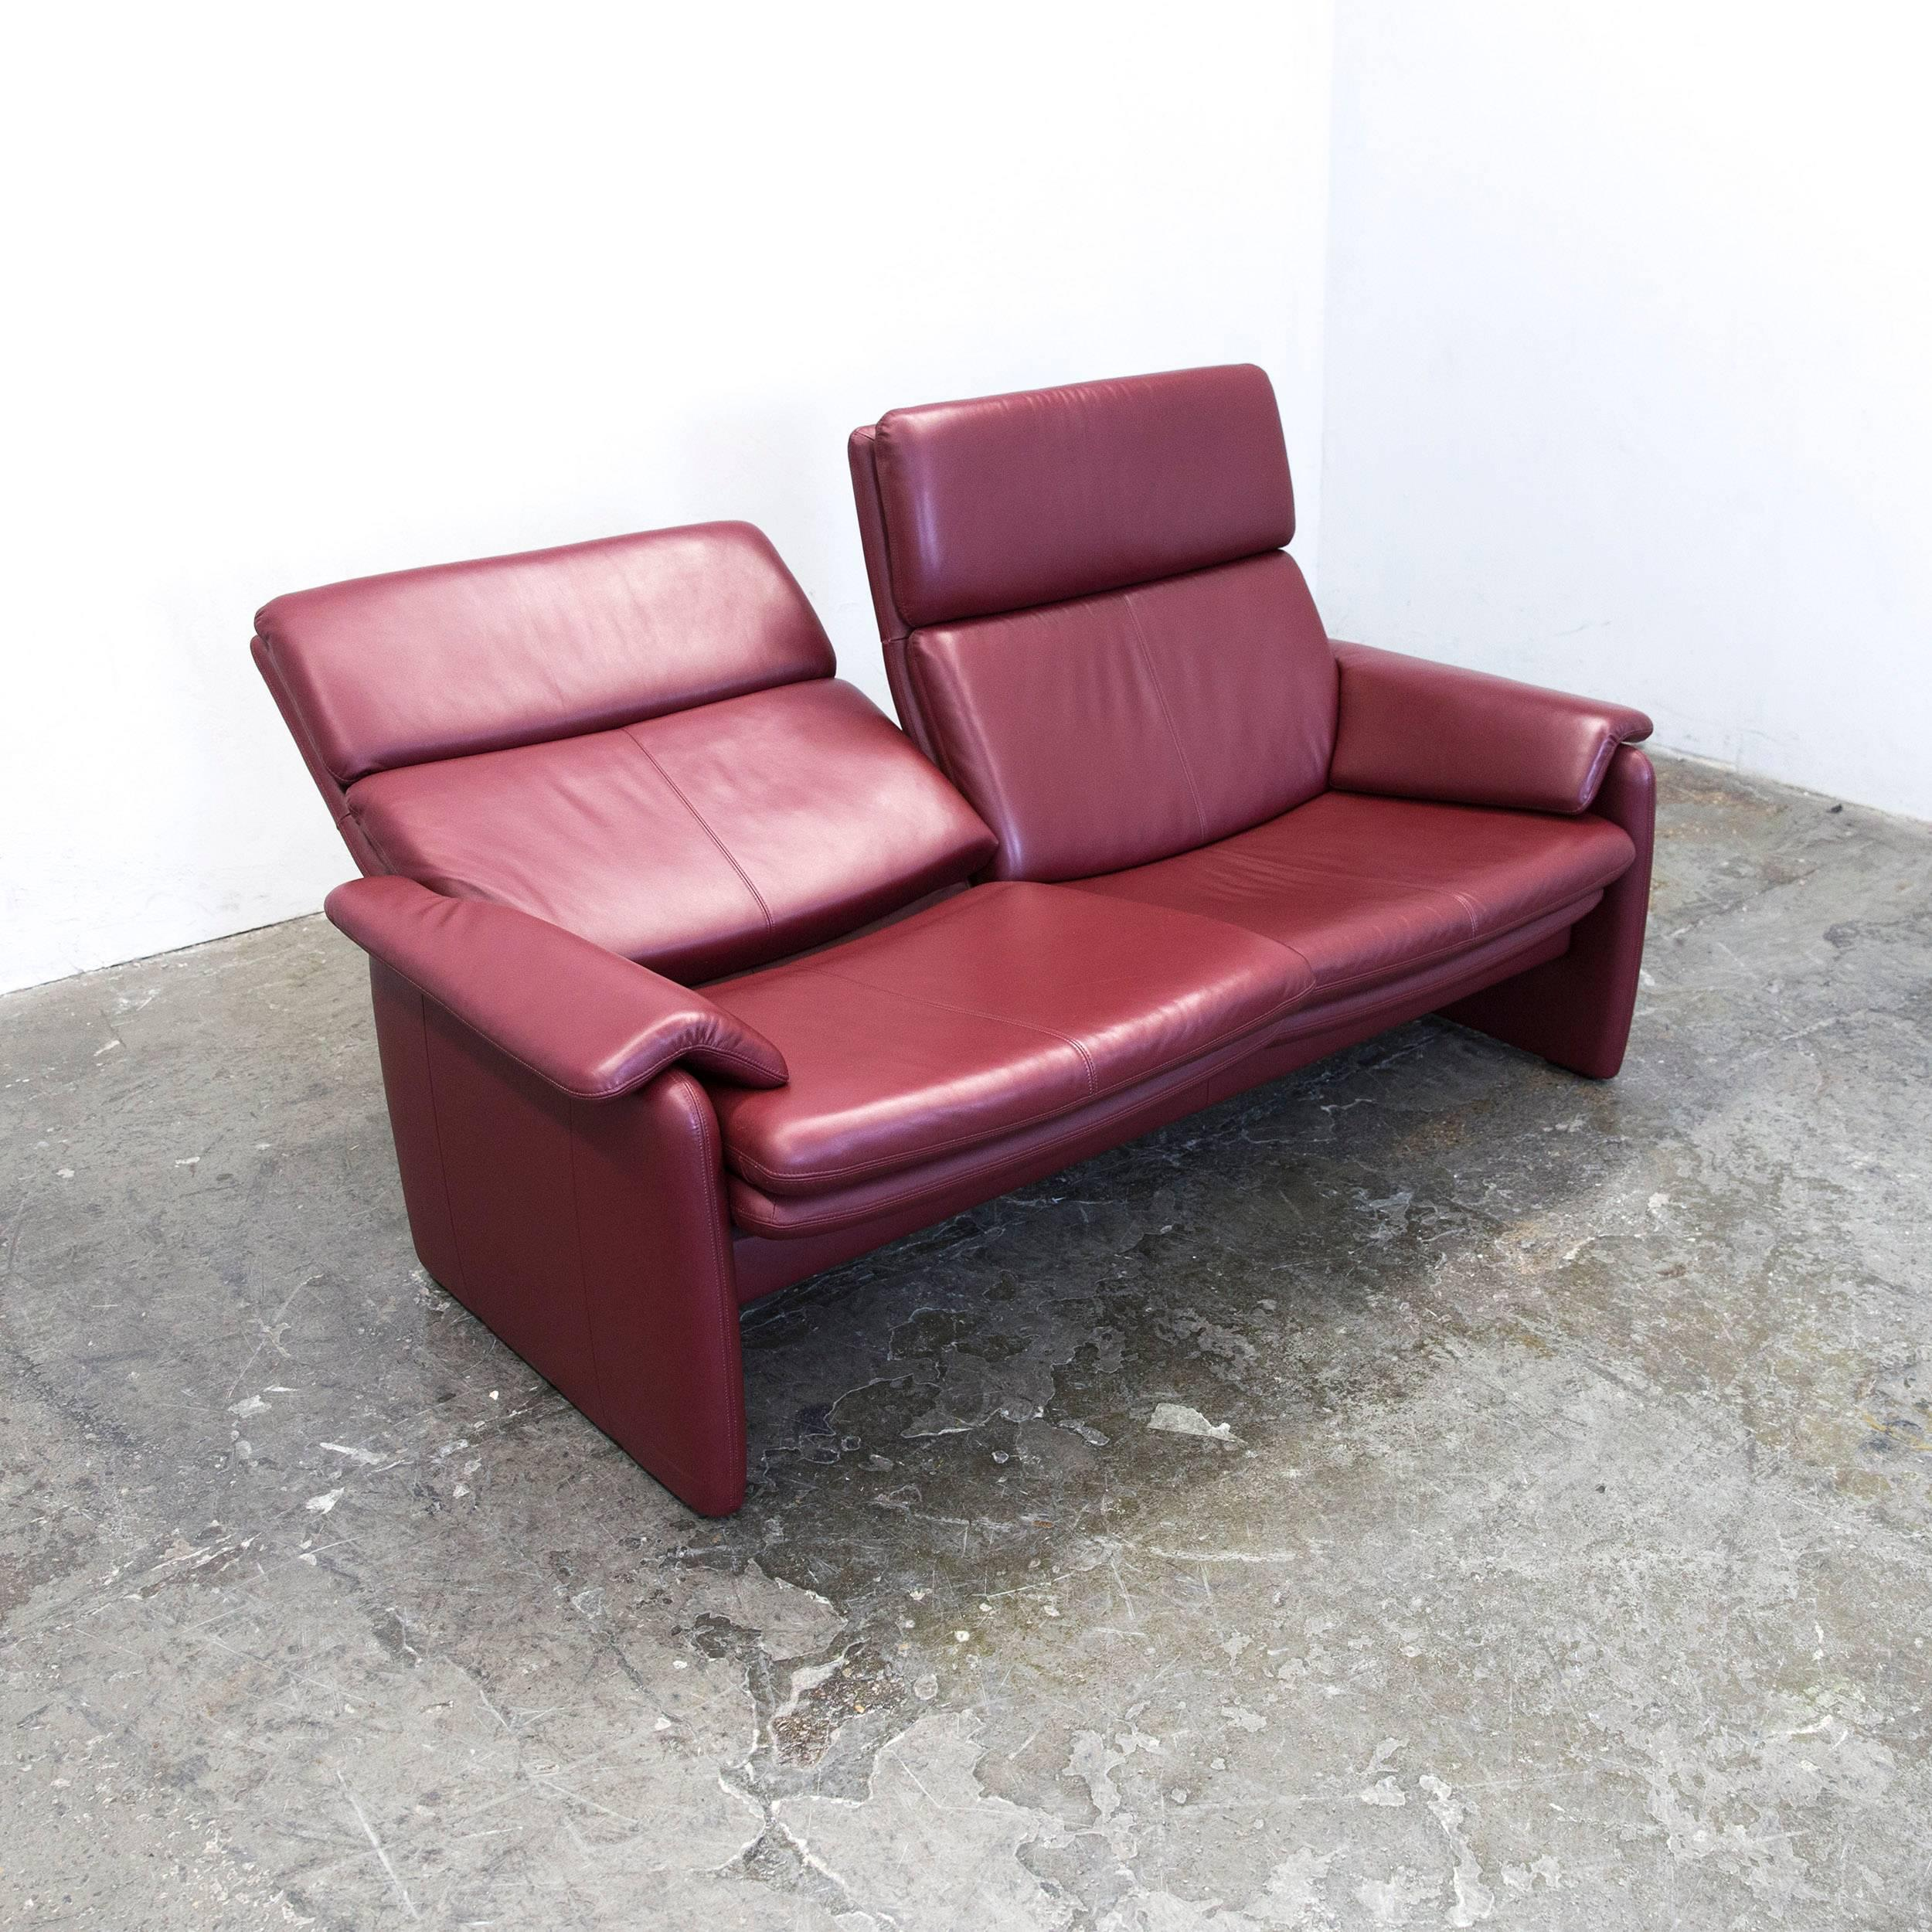 Designer Couch Leder Trendy Sofa Bed Sofa Bed Table New Pocco Sofa